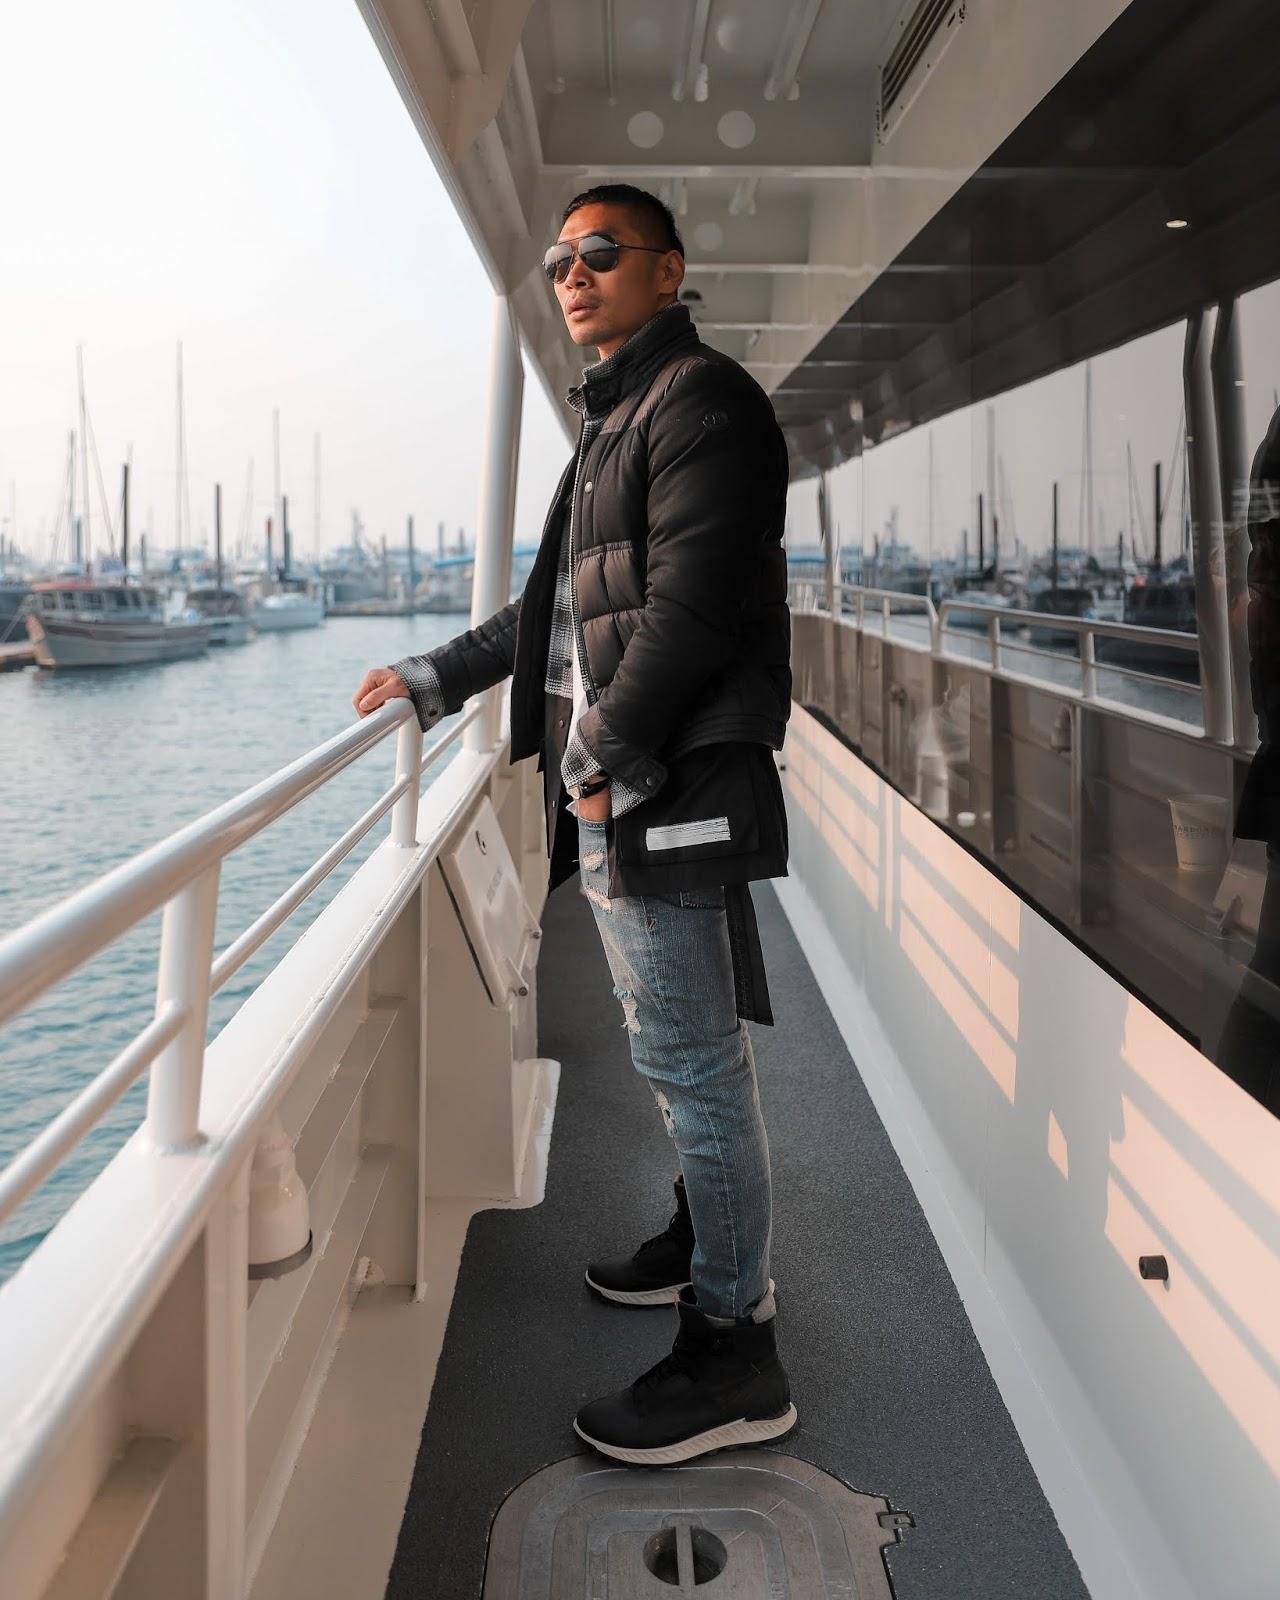 Major Marine Tour, Leo Chan